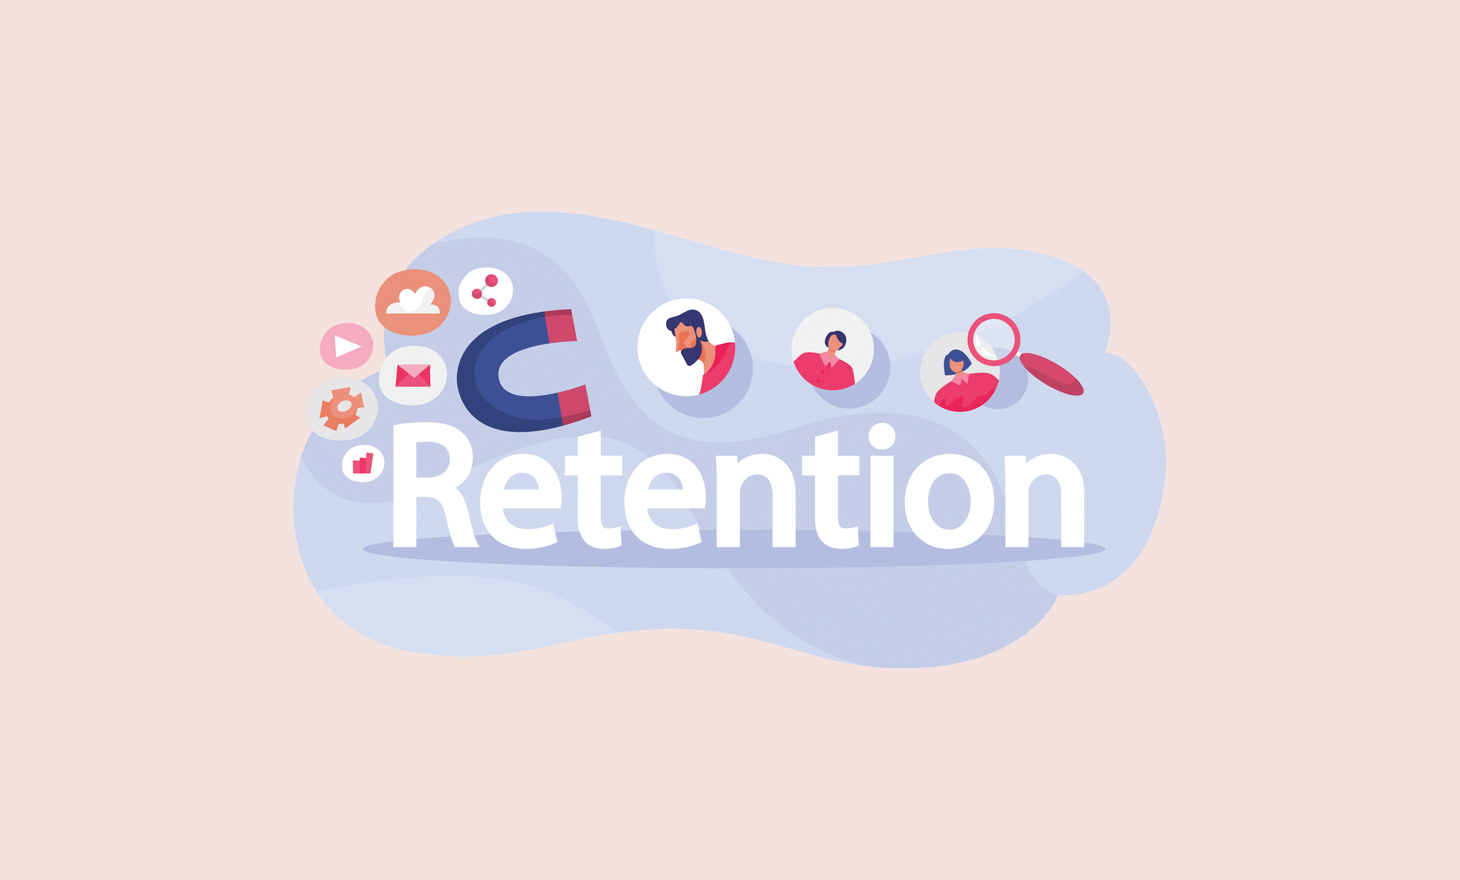 5 Fantastic Powerful Strategies for Customer Retention